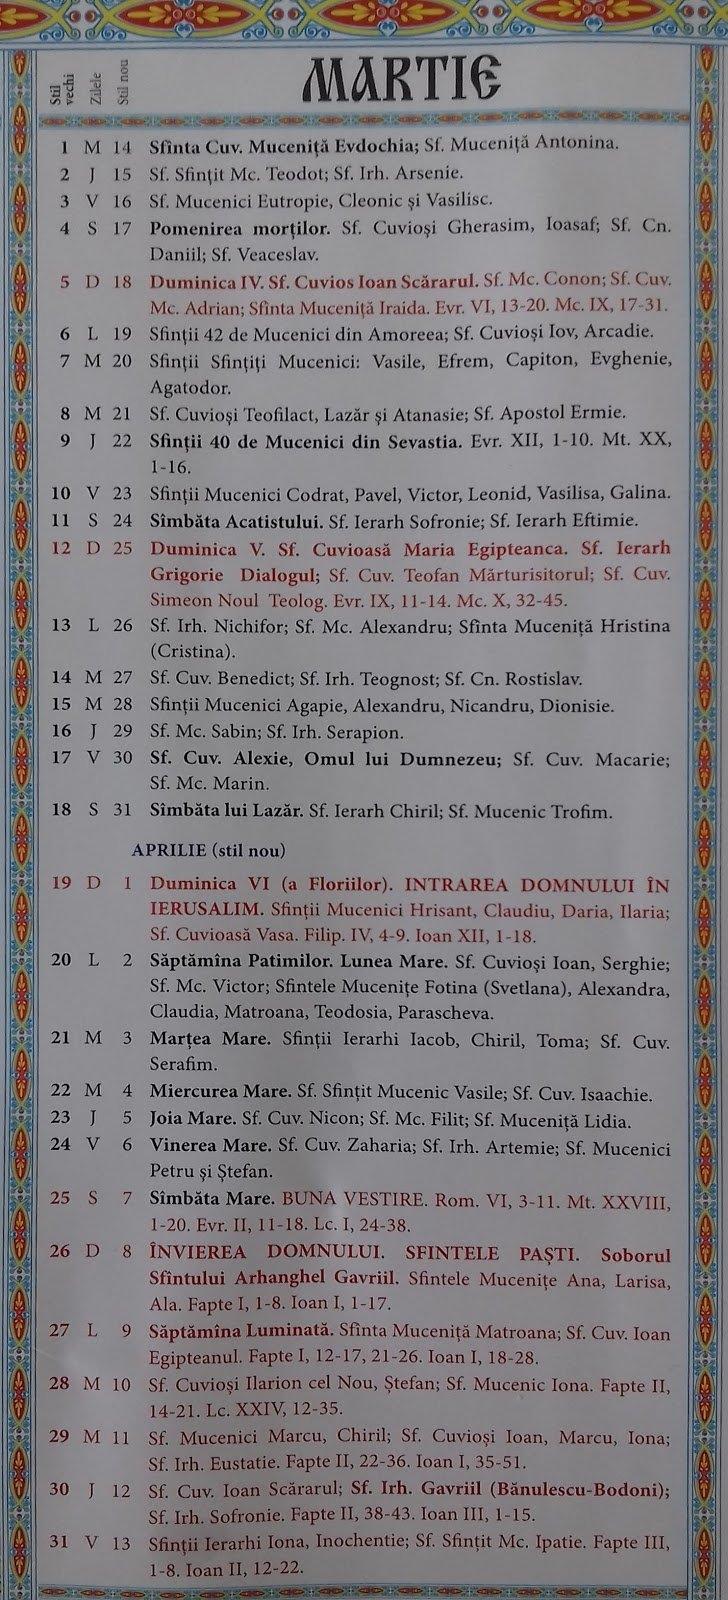 Calendar Crestin Ortodox 2018-2019 Stil Vechi Republica Moldova 8 Iunie 2019 Calendar Ortodox